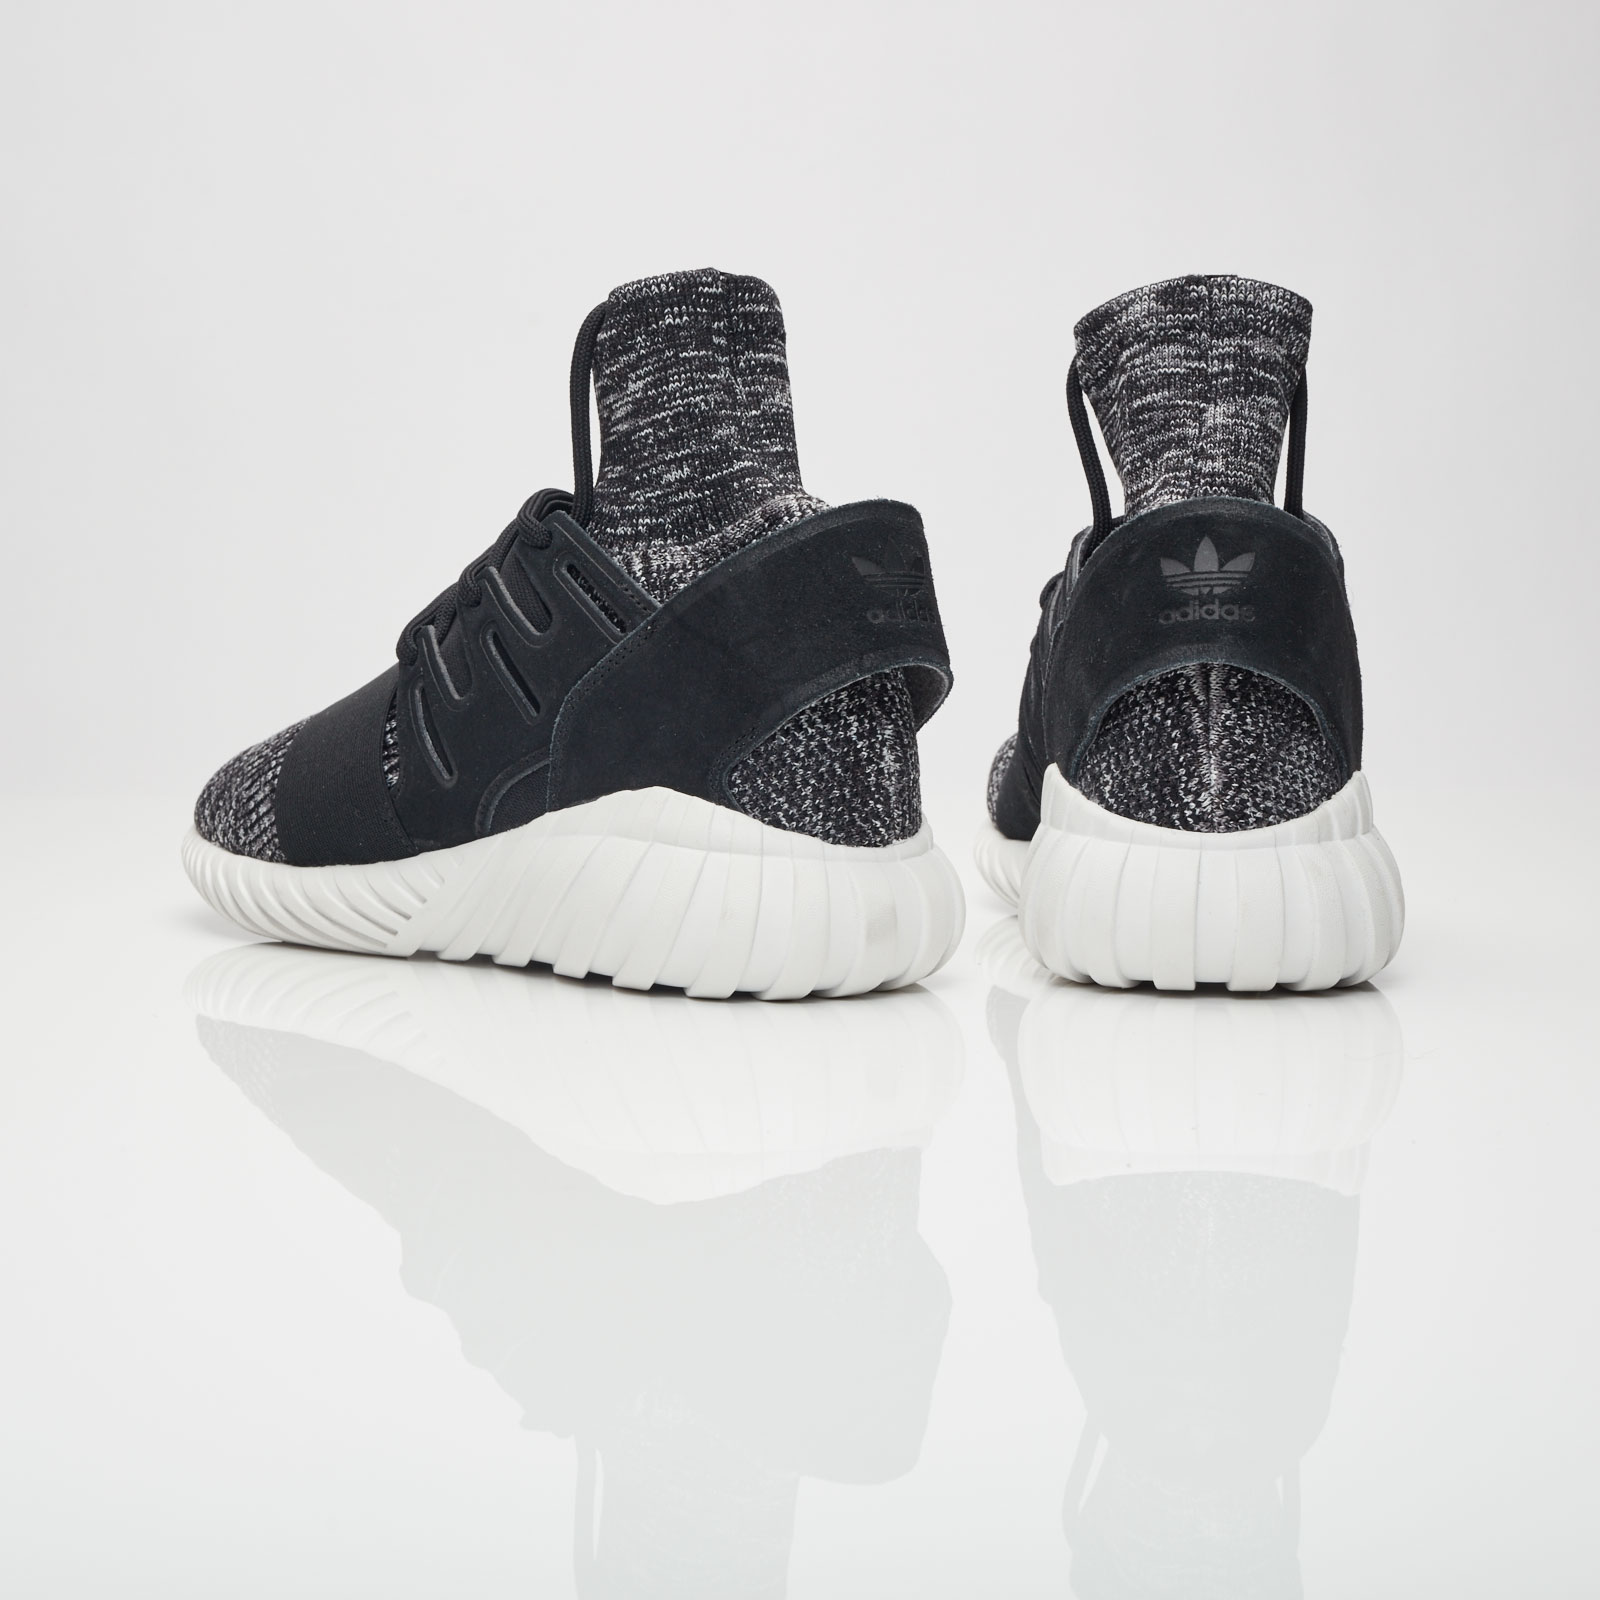 timeless design 7a645 b314a adidas Tubular Doom PK - Bb2392 - Sneakersnstuff   sneakers ...